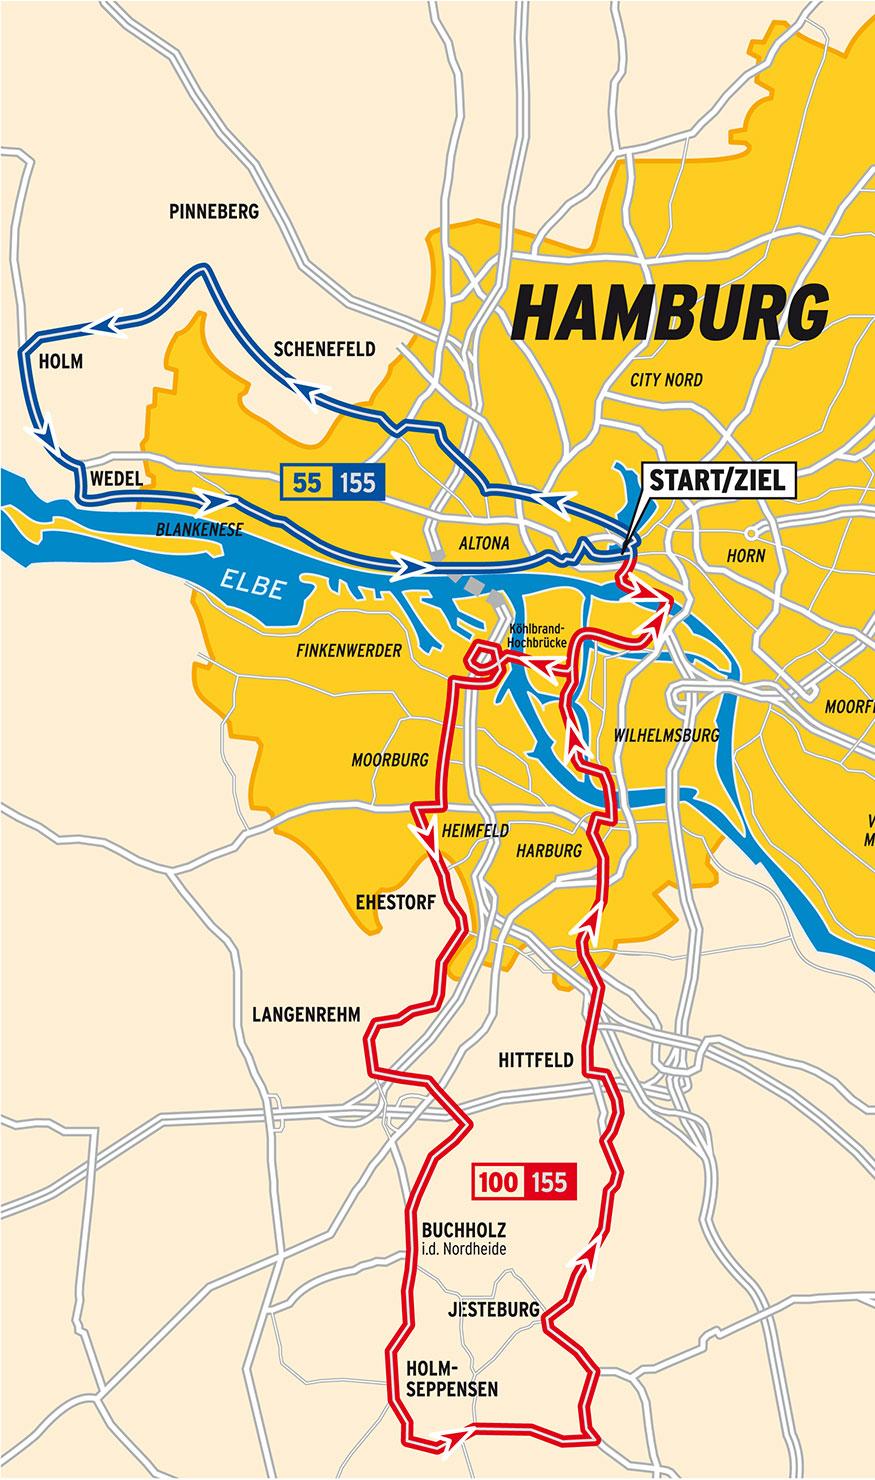 Cyclassics-Streckenabfahrt, Cyclassics-Strecke